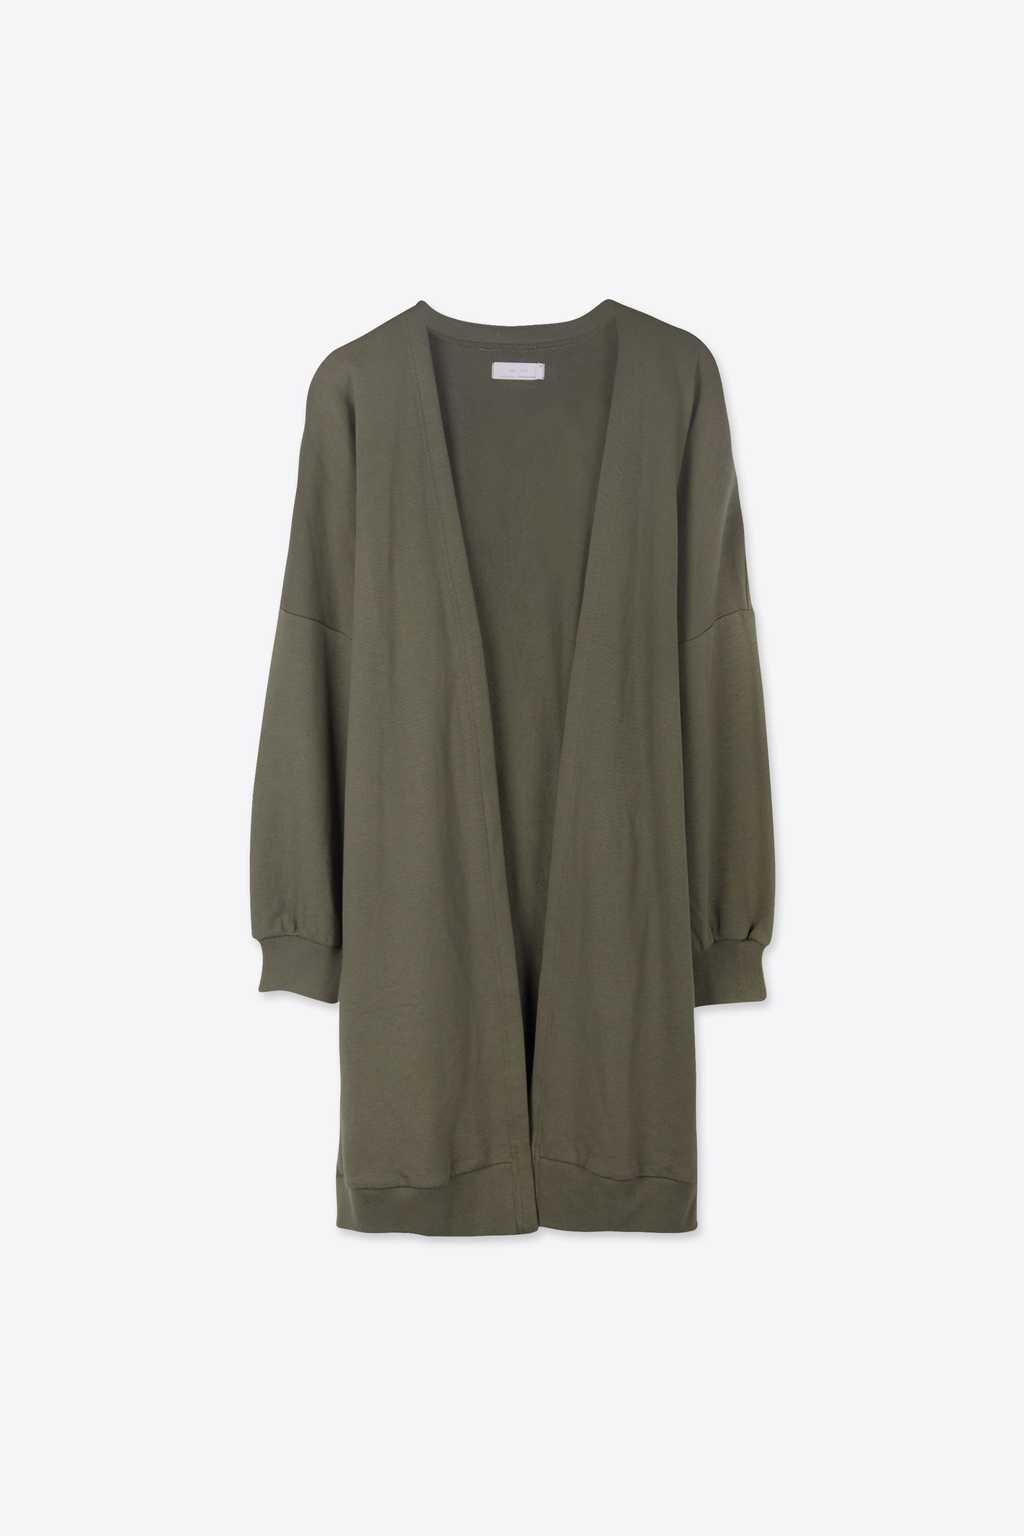 Cardigan 1438 Olive 5